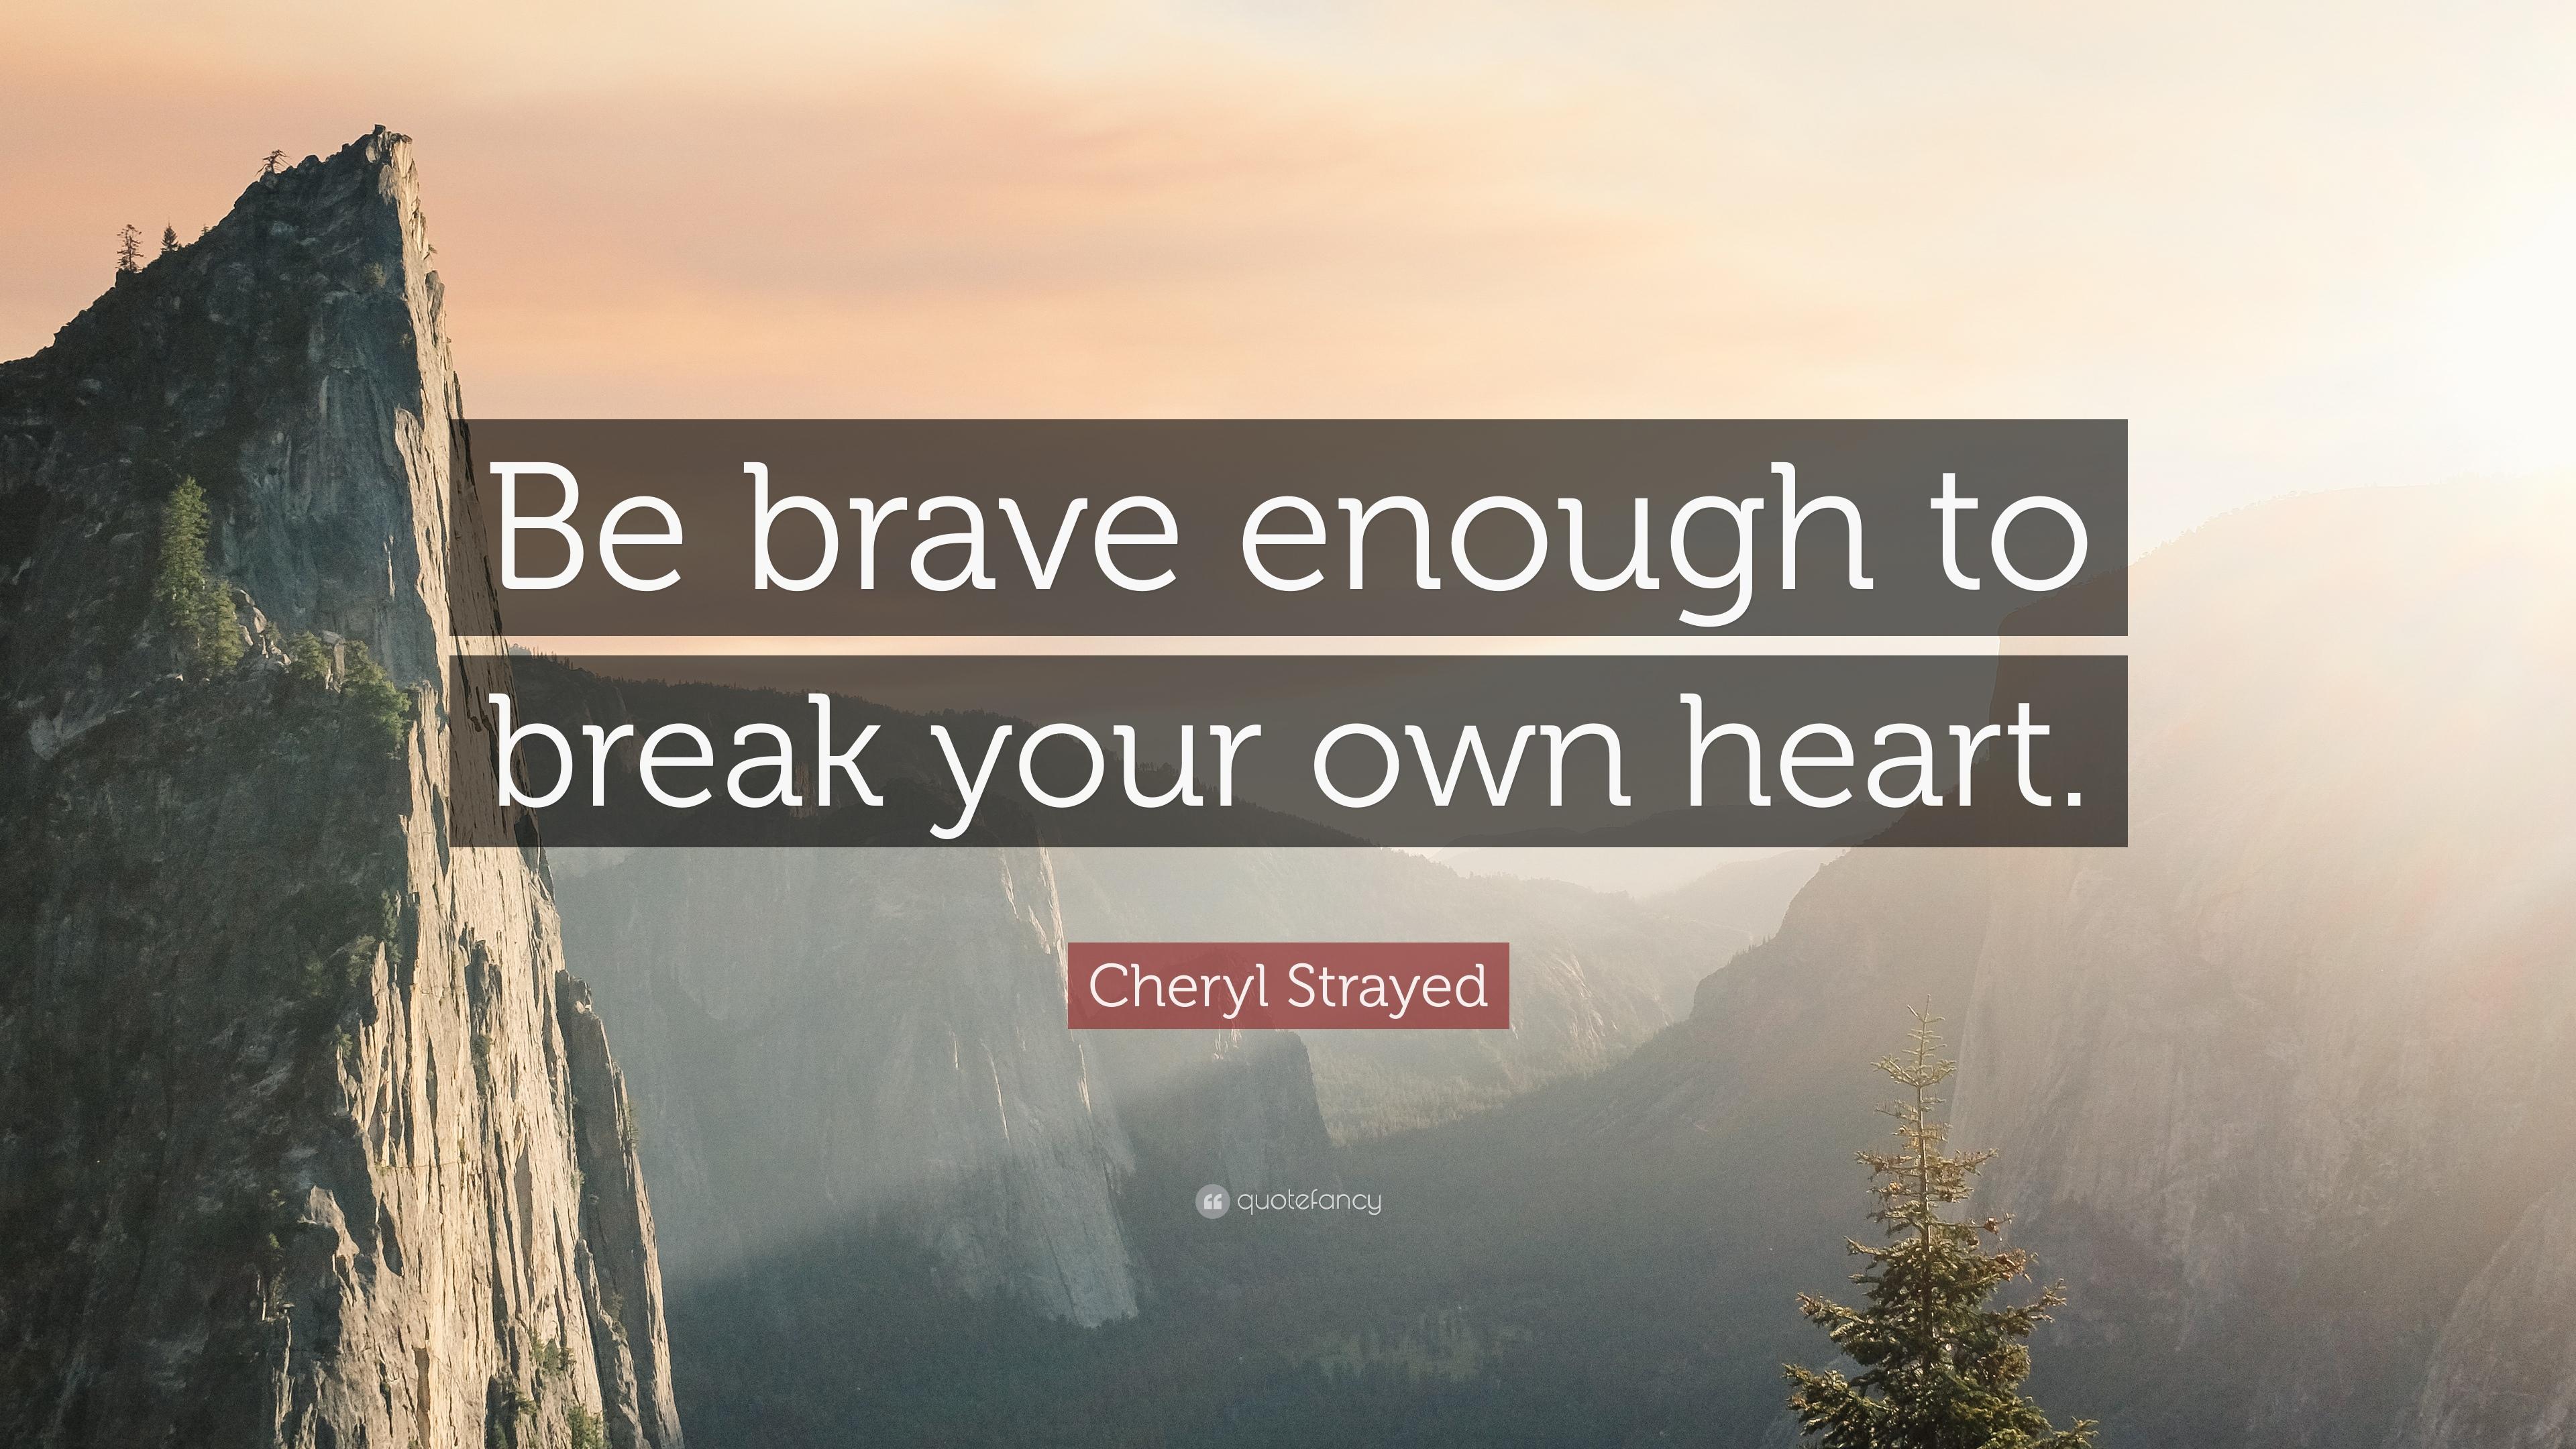 Cheryl Strayed Brave Enough Quotes Pinterest thumbnail